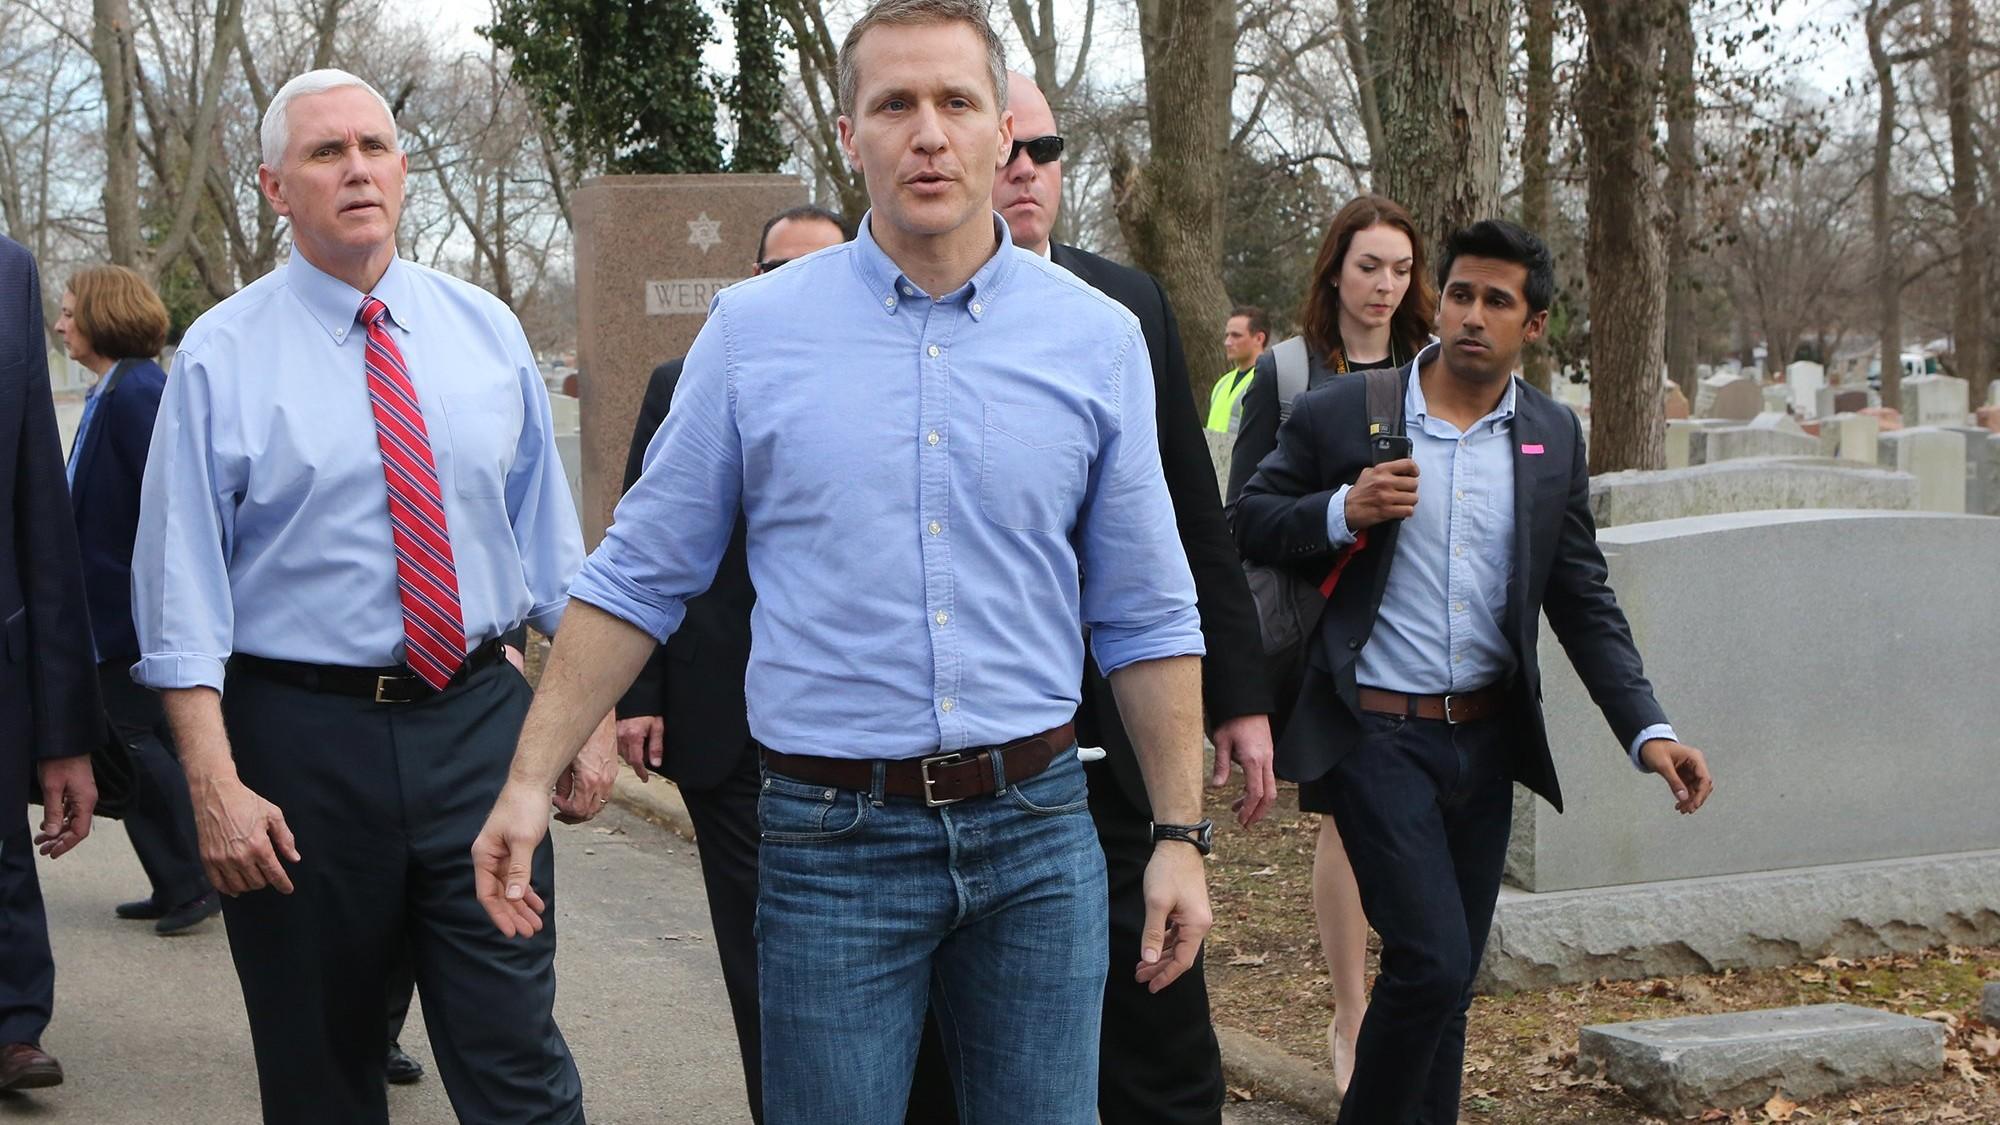 Missouri Gov. Eric Greitens was just arrested for secretly